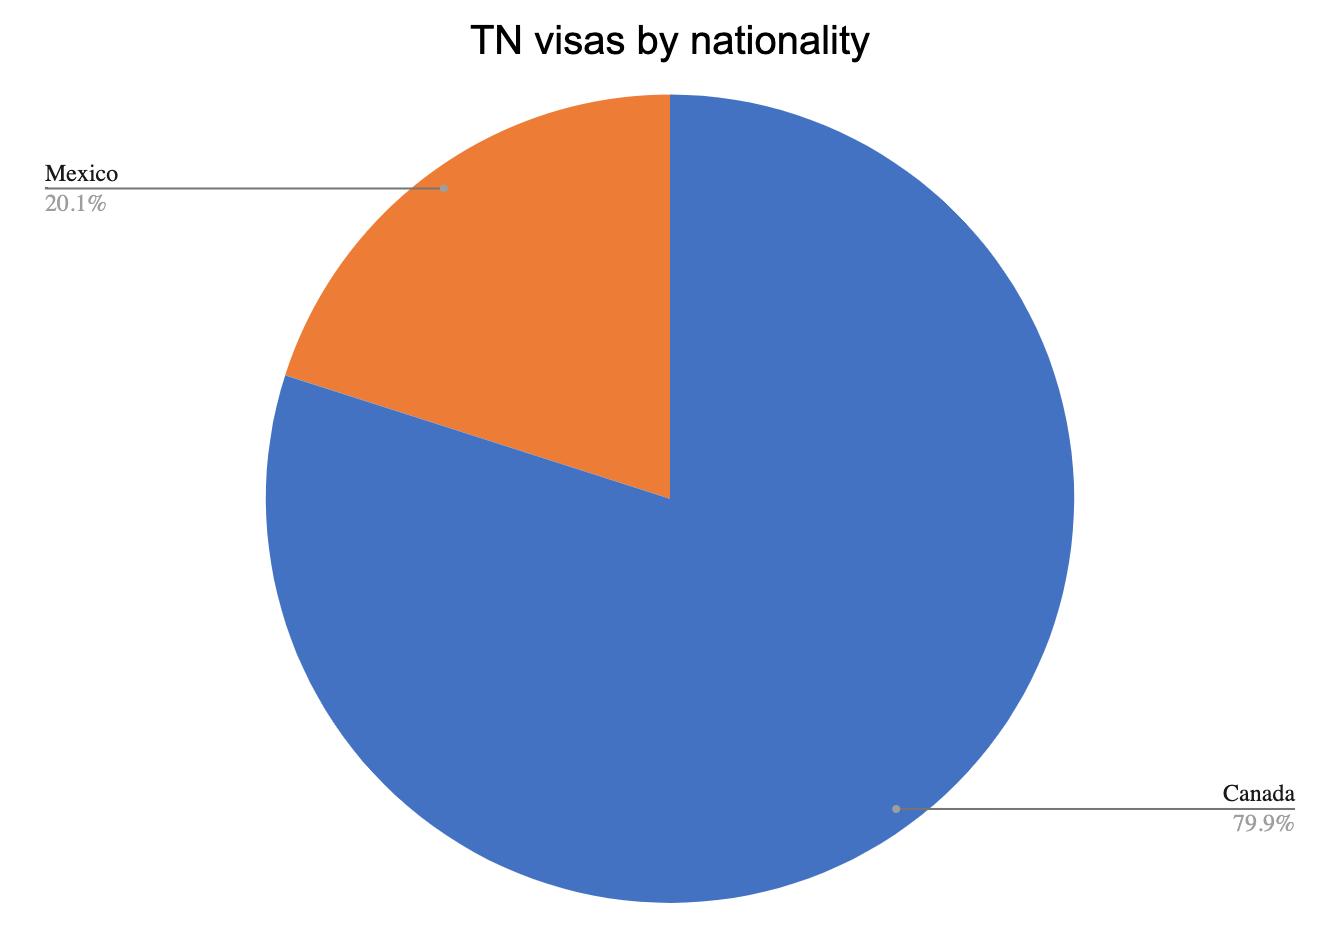 TN visas by nationality